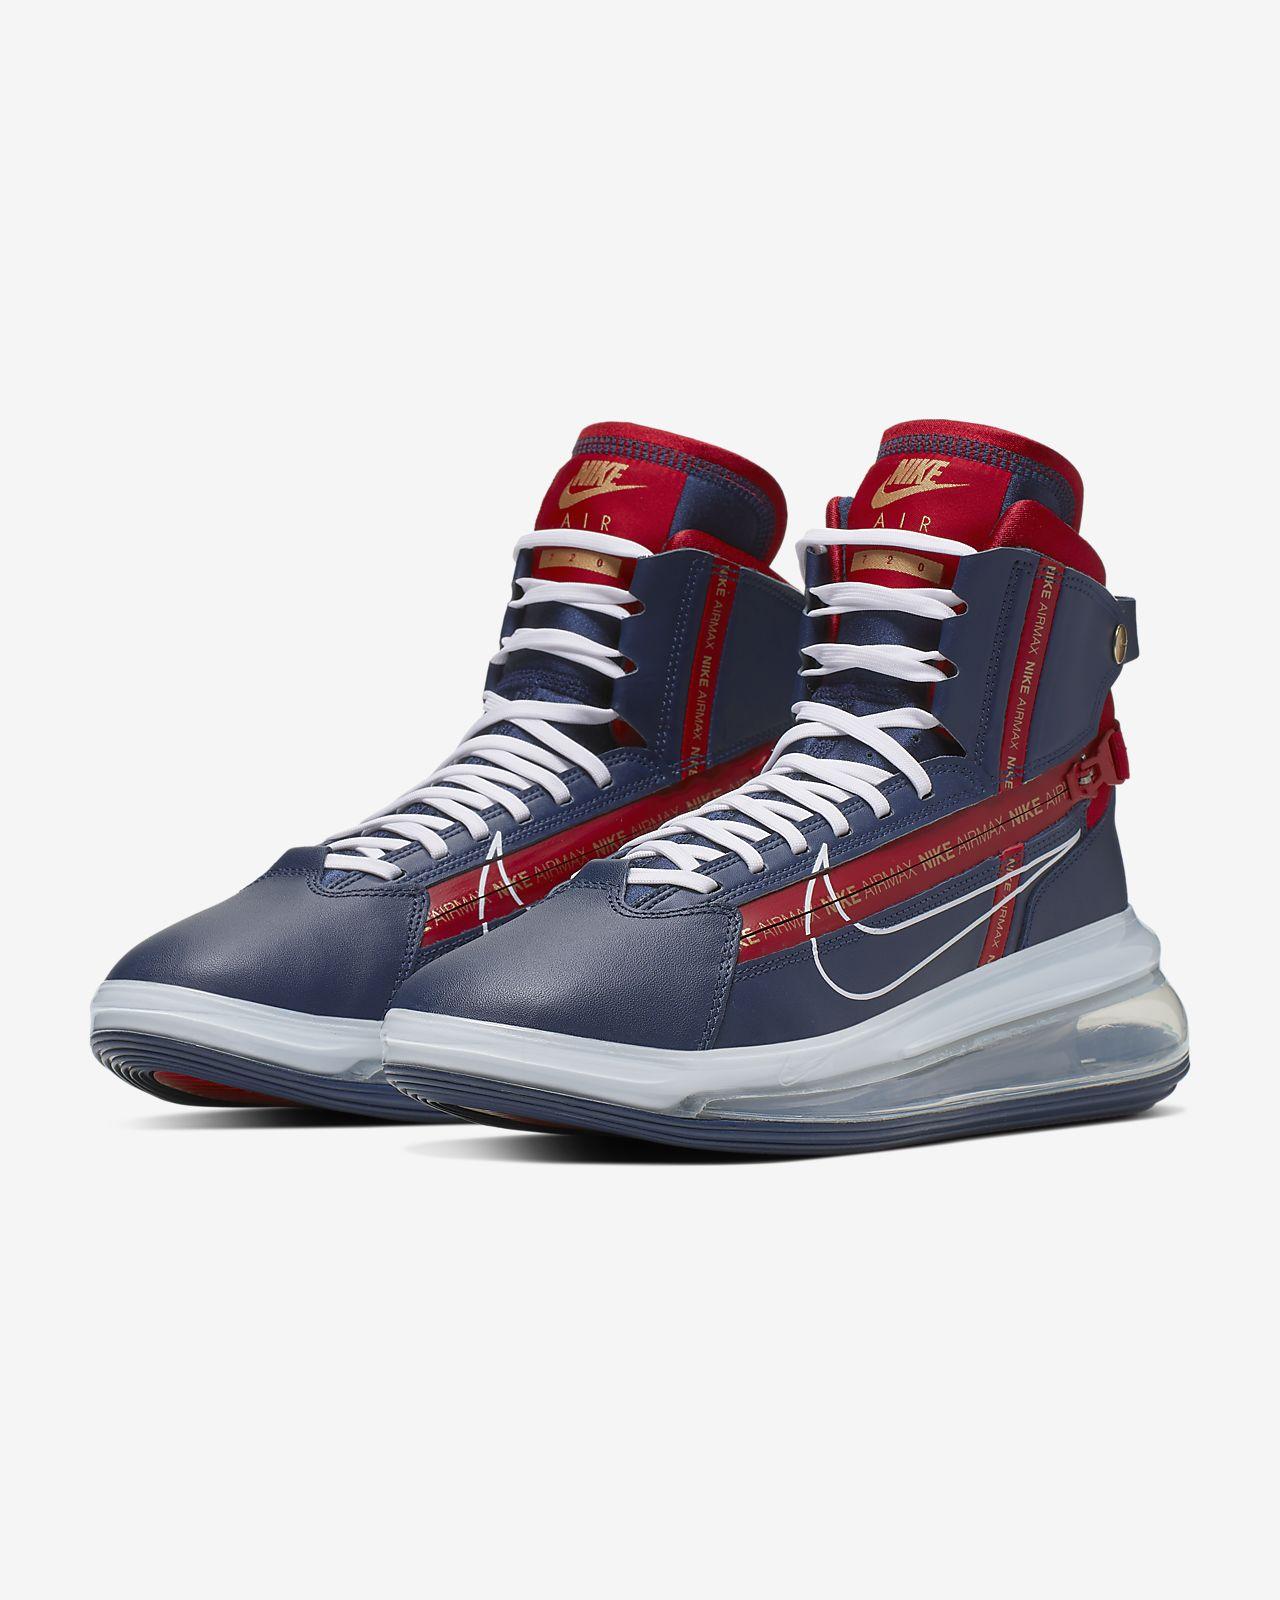 men's nike air max 720 satrn all-star basketball shoes